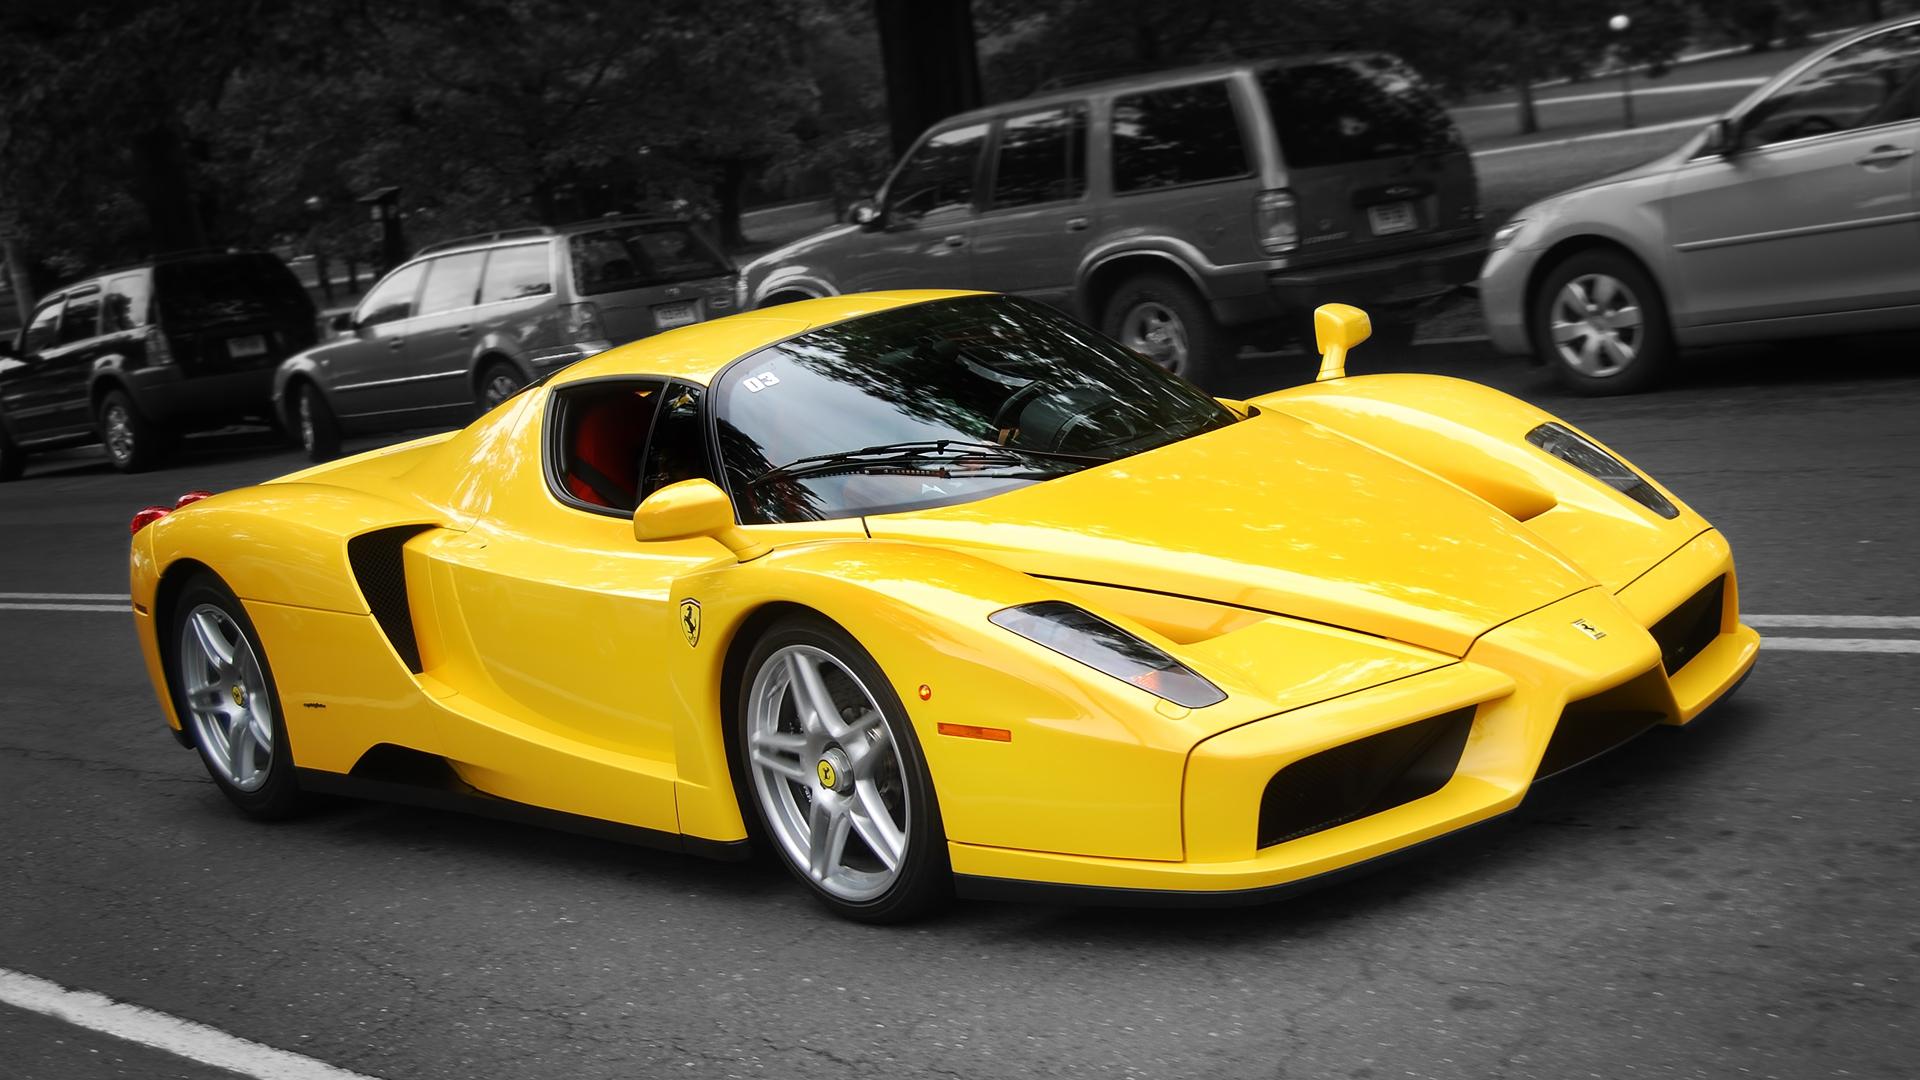 Yellow Enzo Ferrari Hd Wallpaper 1920x1080 Gludy